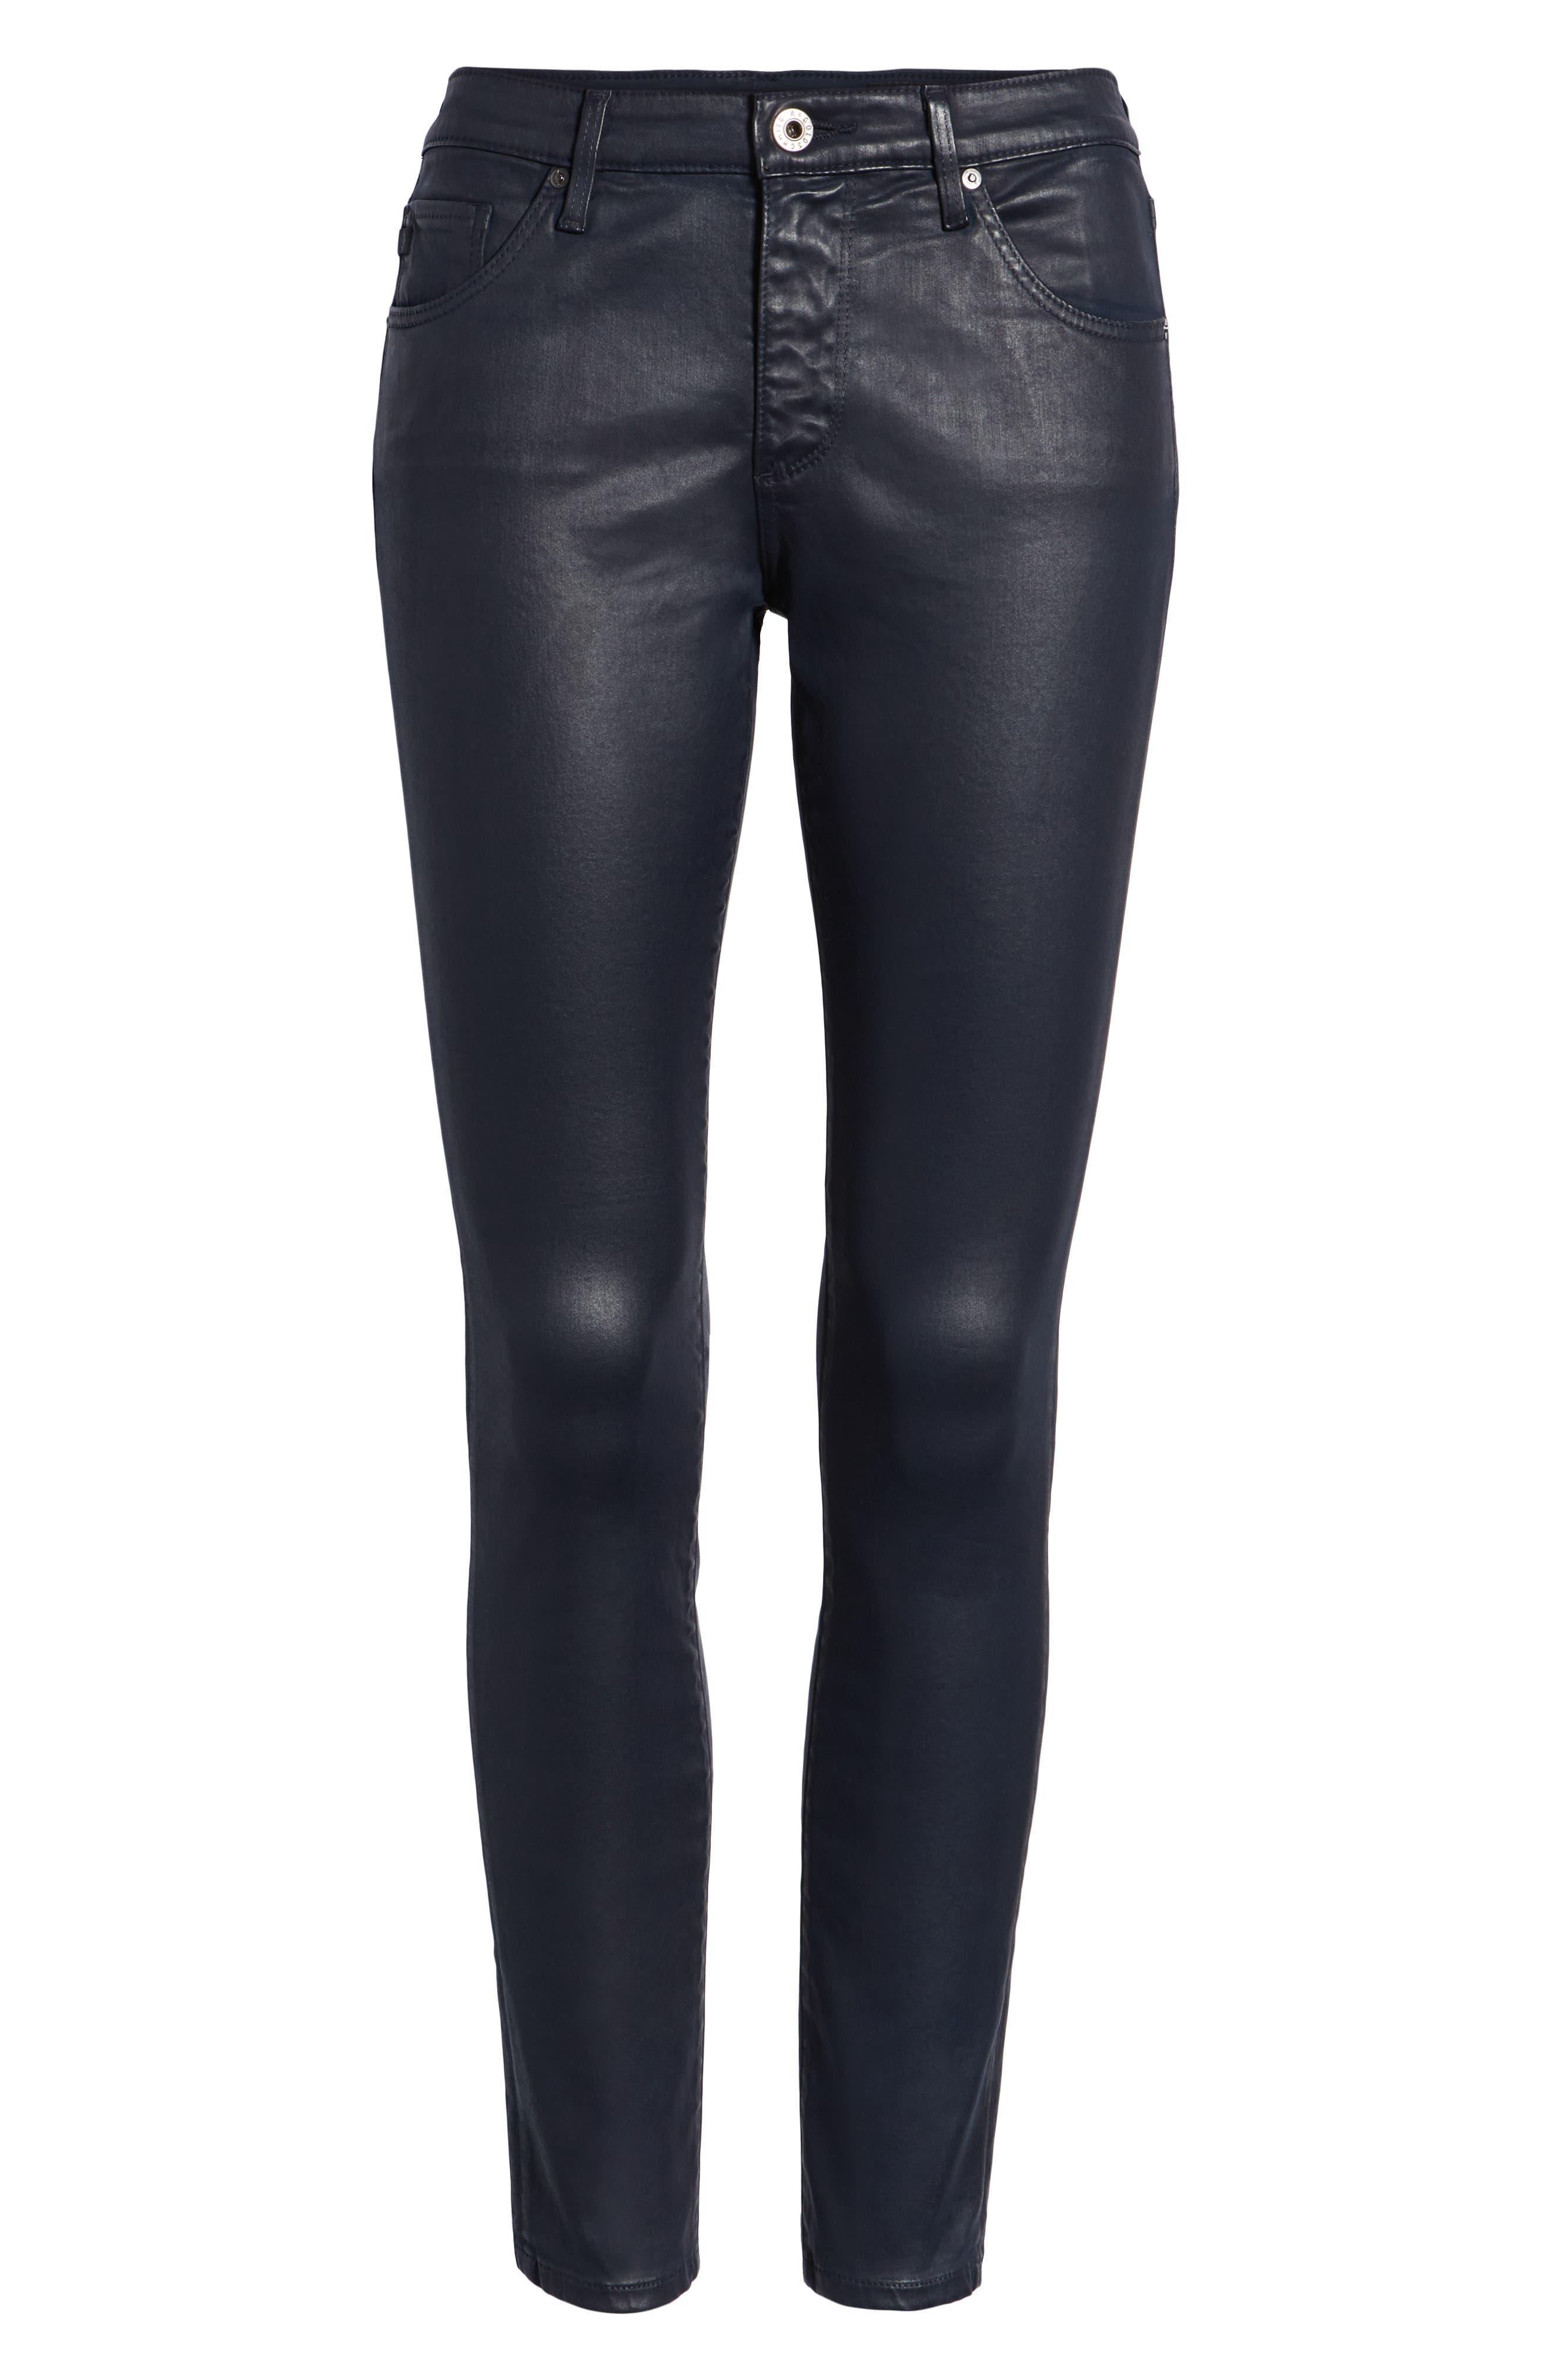 'The Legging' Coated Ankle Jeans,                             Alternate thumbnail 7, color,                             LEATHERETT BLUE VAULT